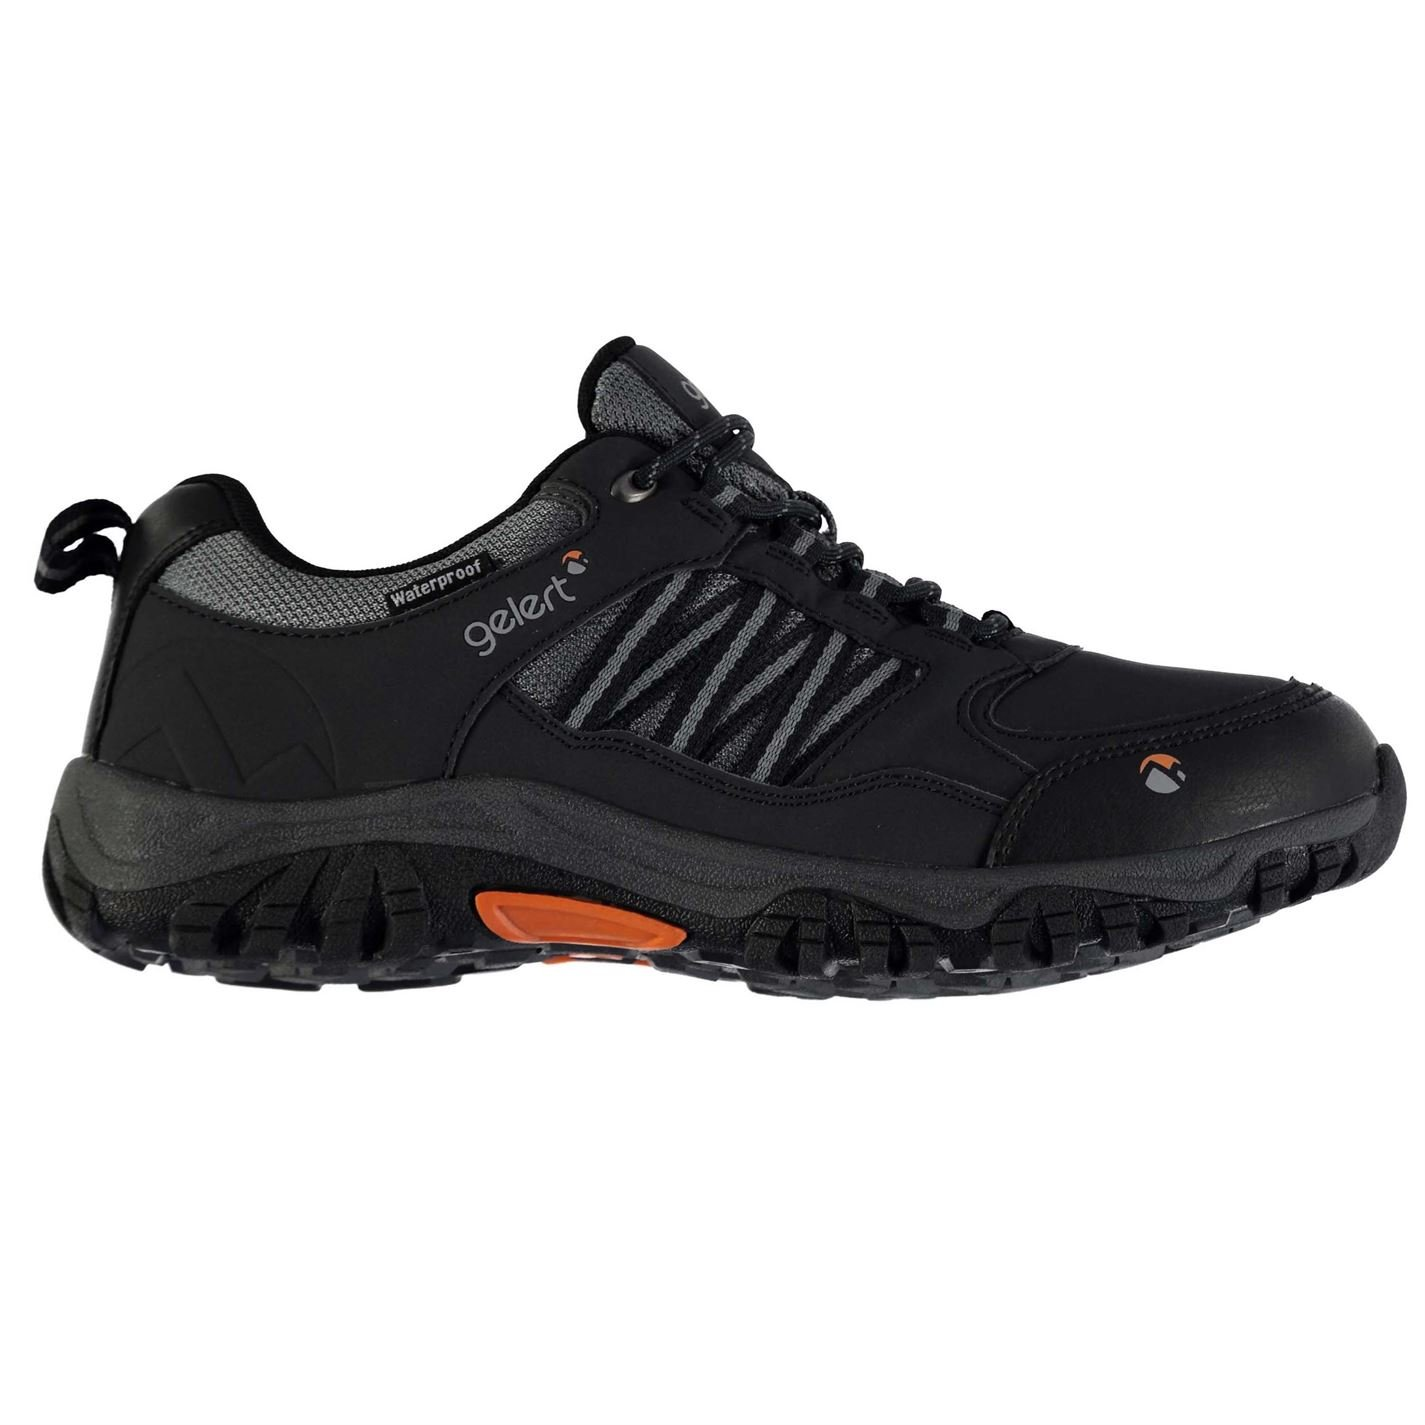 427b436b9b4d3d Gelert Mens Horizon Low Waterproof Walking Shoes Breathable Outdoor Trekking   Amazon.co.uk  Shoes   Bags